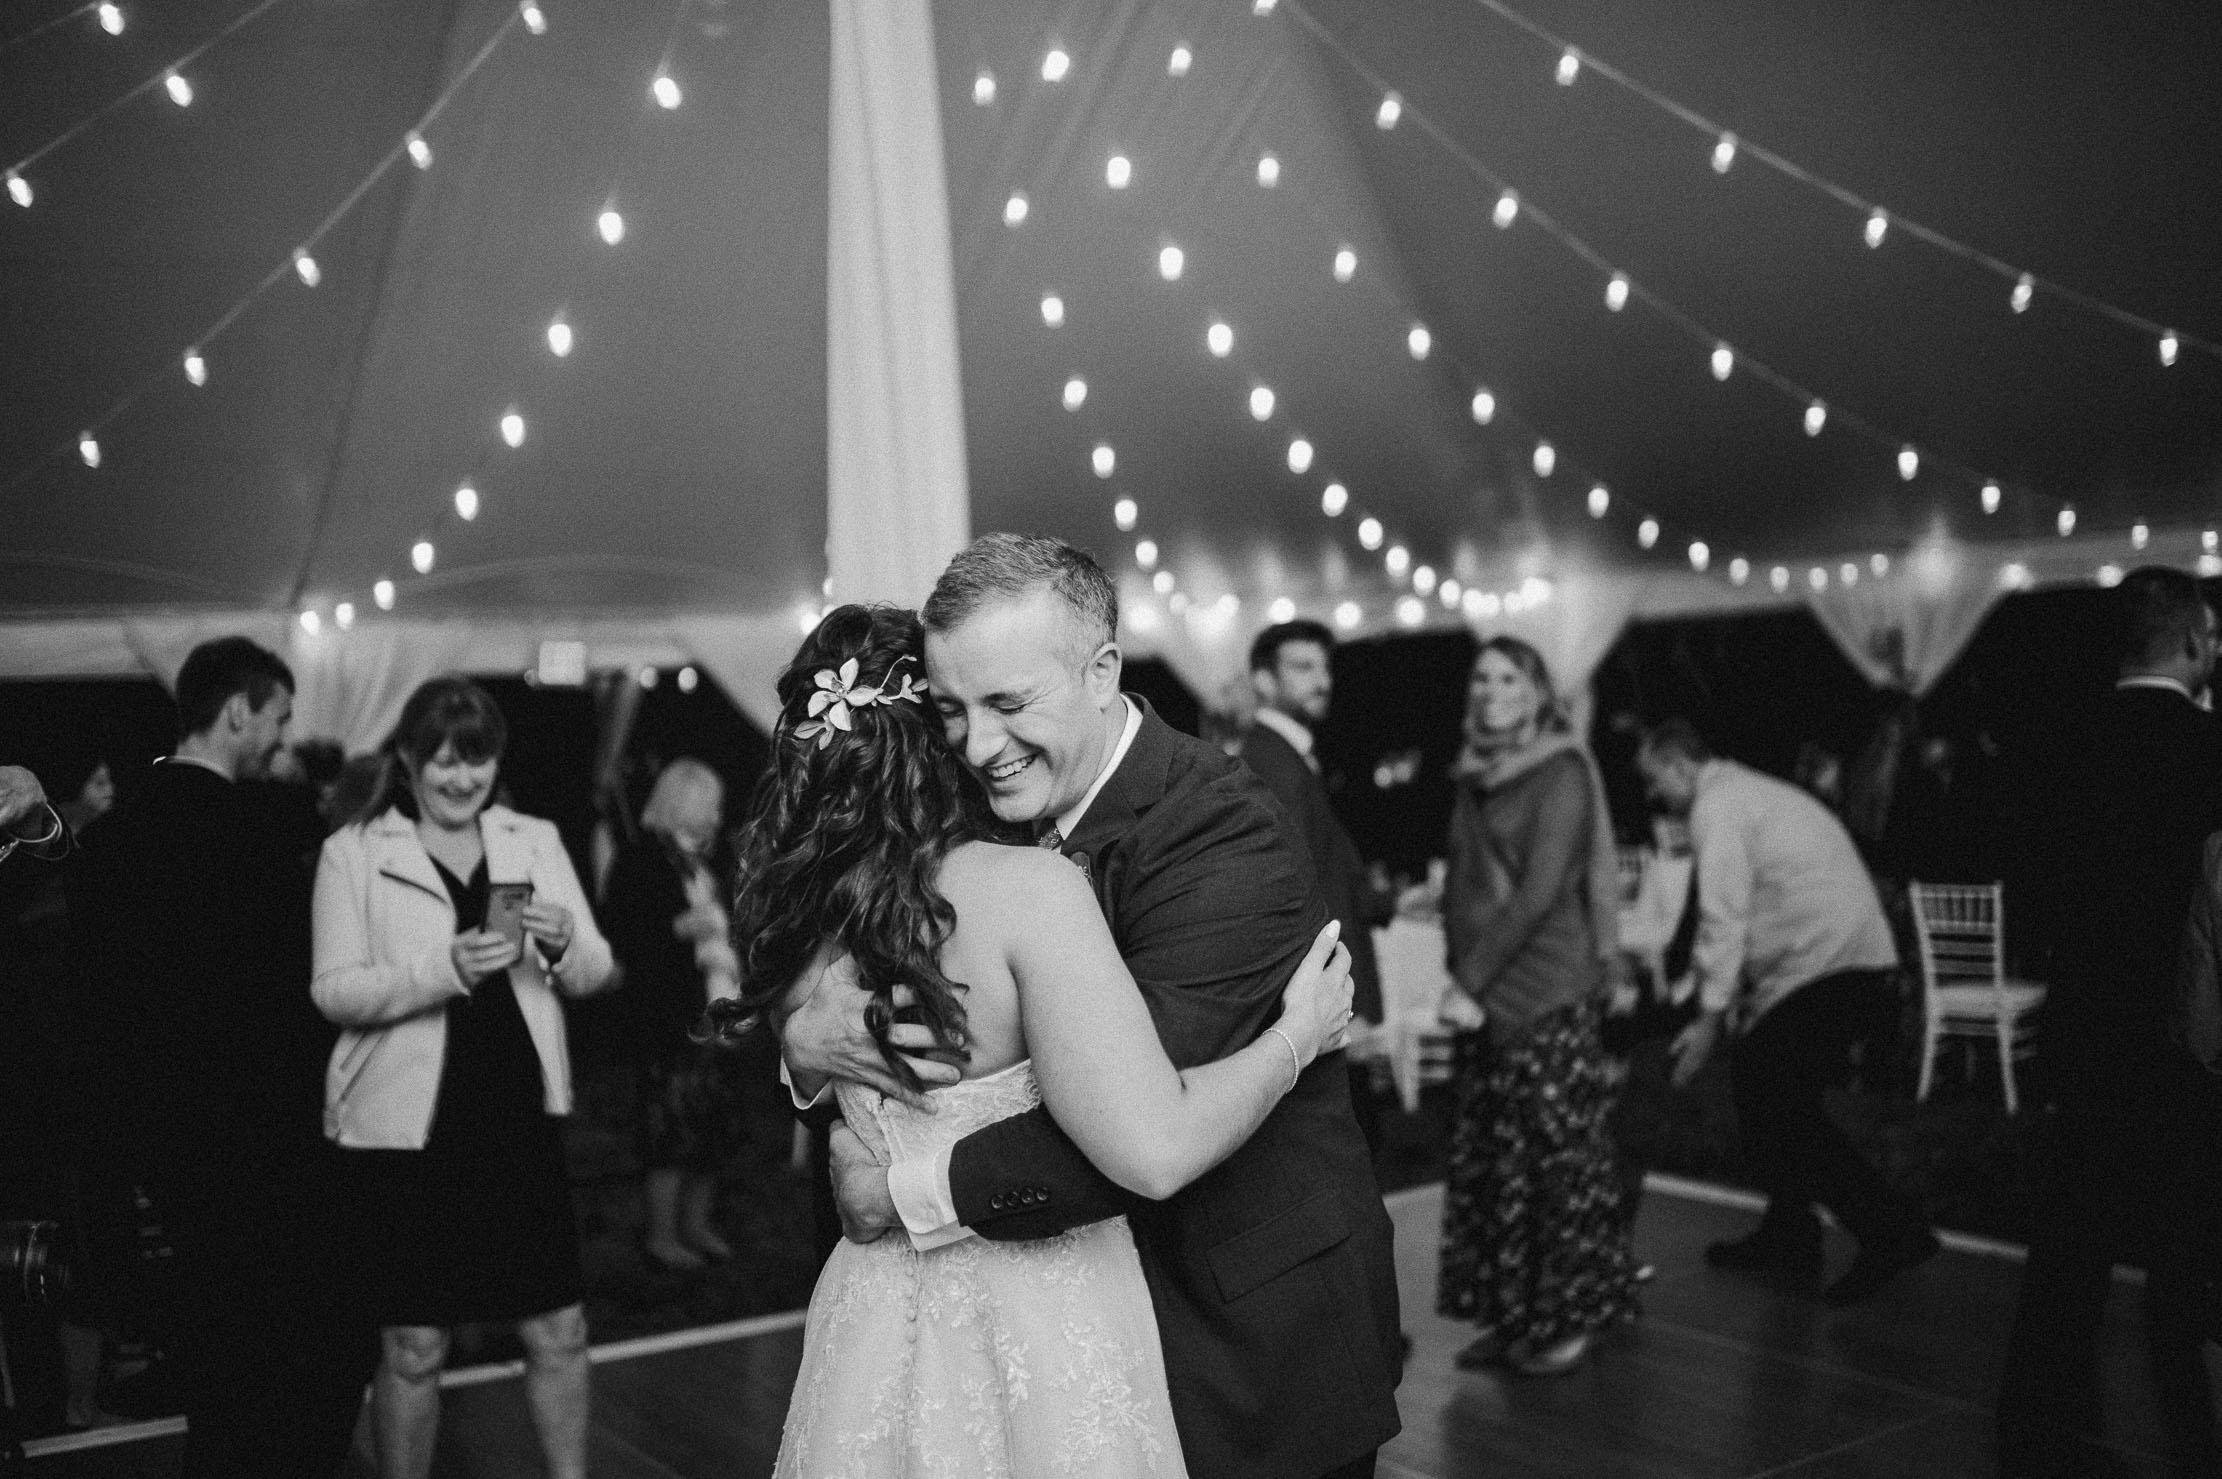 Wings-Castle-Millbrook-NY-Upstate-Wedding-Photographer-1174.jpg